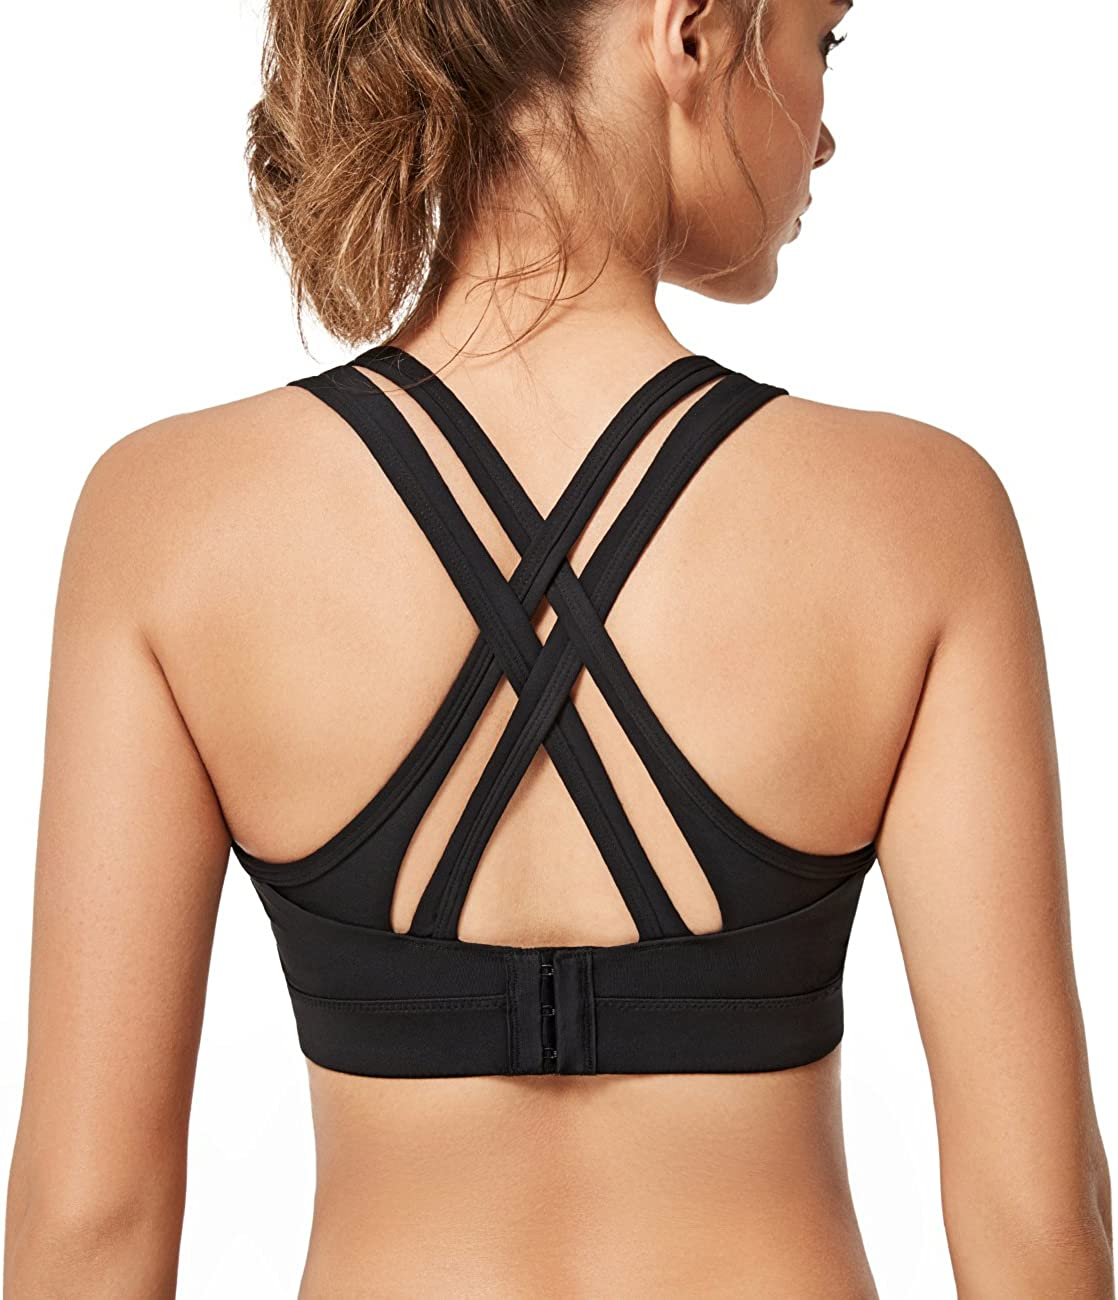 Details about  /Cross Beauty Back Shockproof Fitness SPORTS Bra